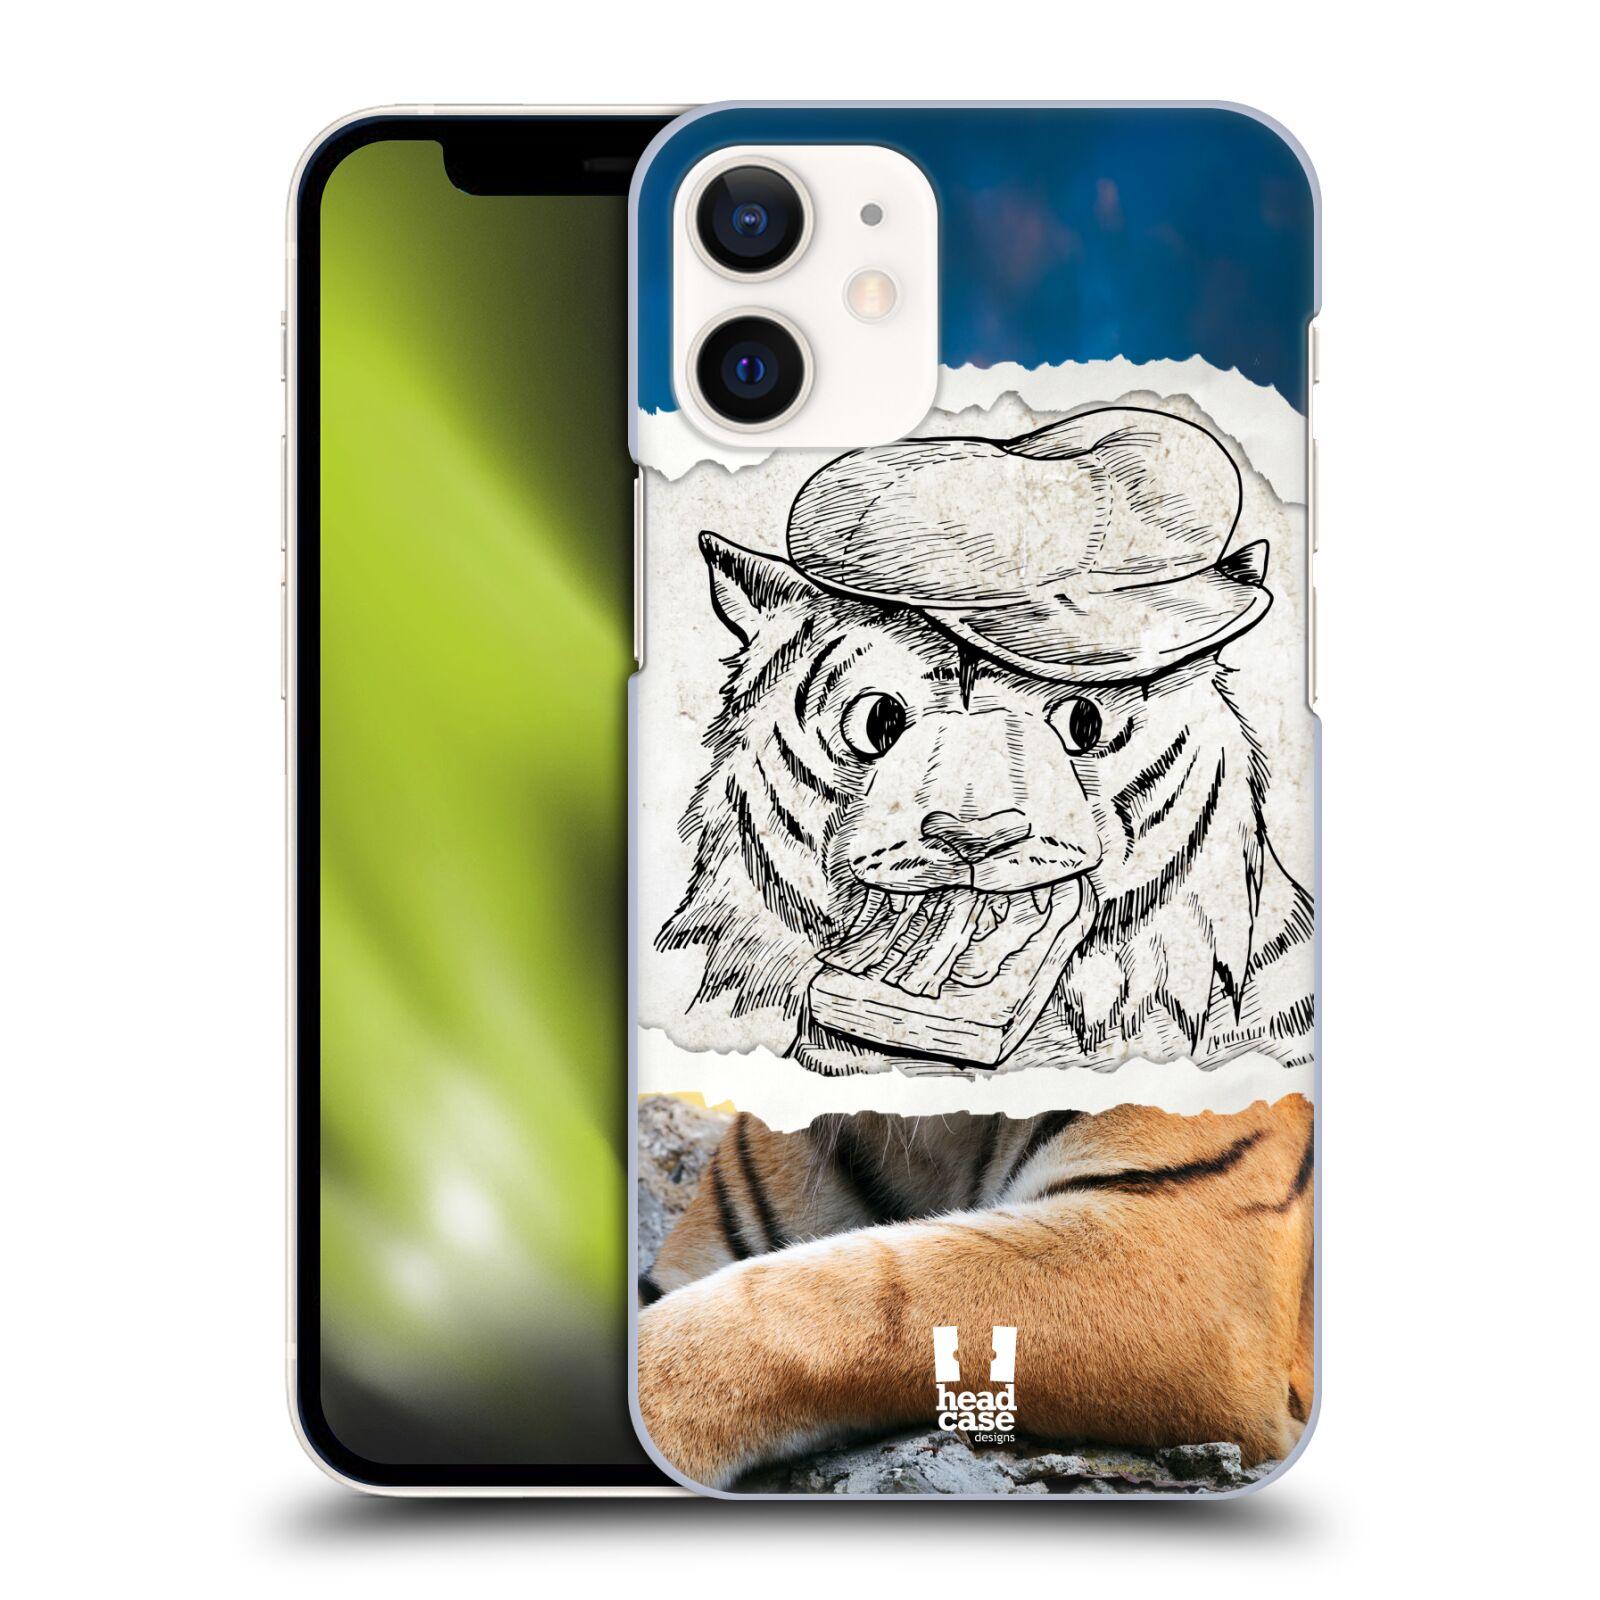 Plastový obal na mobil Apple Iphone 12 MINI vzor zvířata koláž tygr fešák